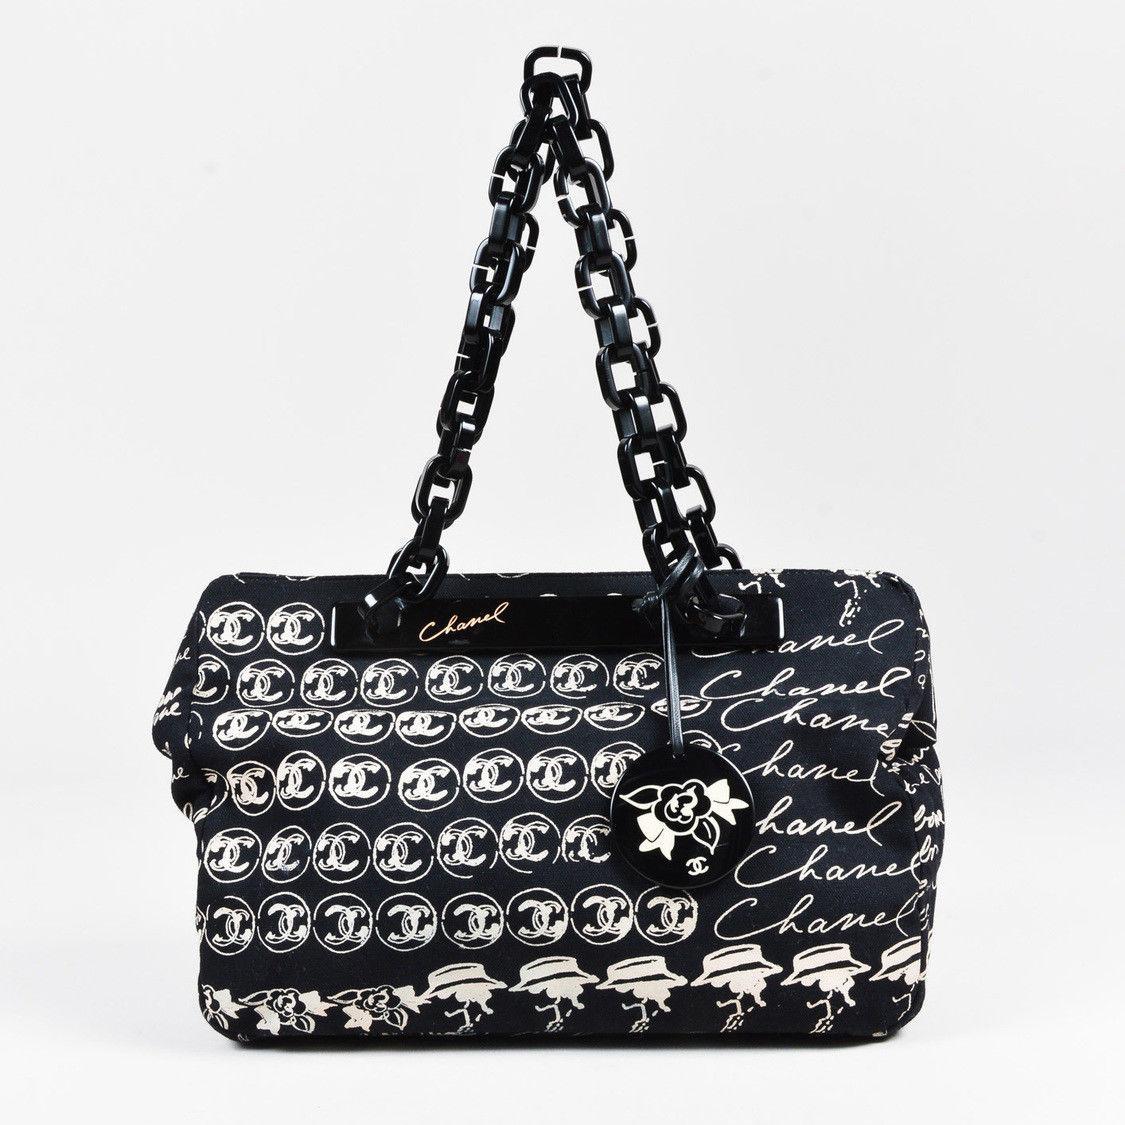 dfa57cc59ccacc Chanel Black Cream Canvas 'CC' Printed Chain and 50 similar items